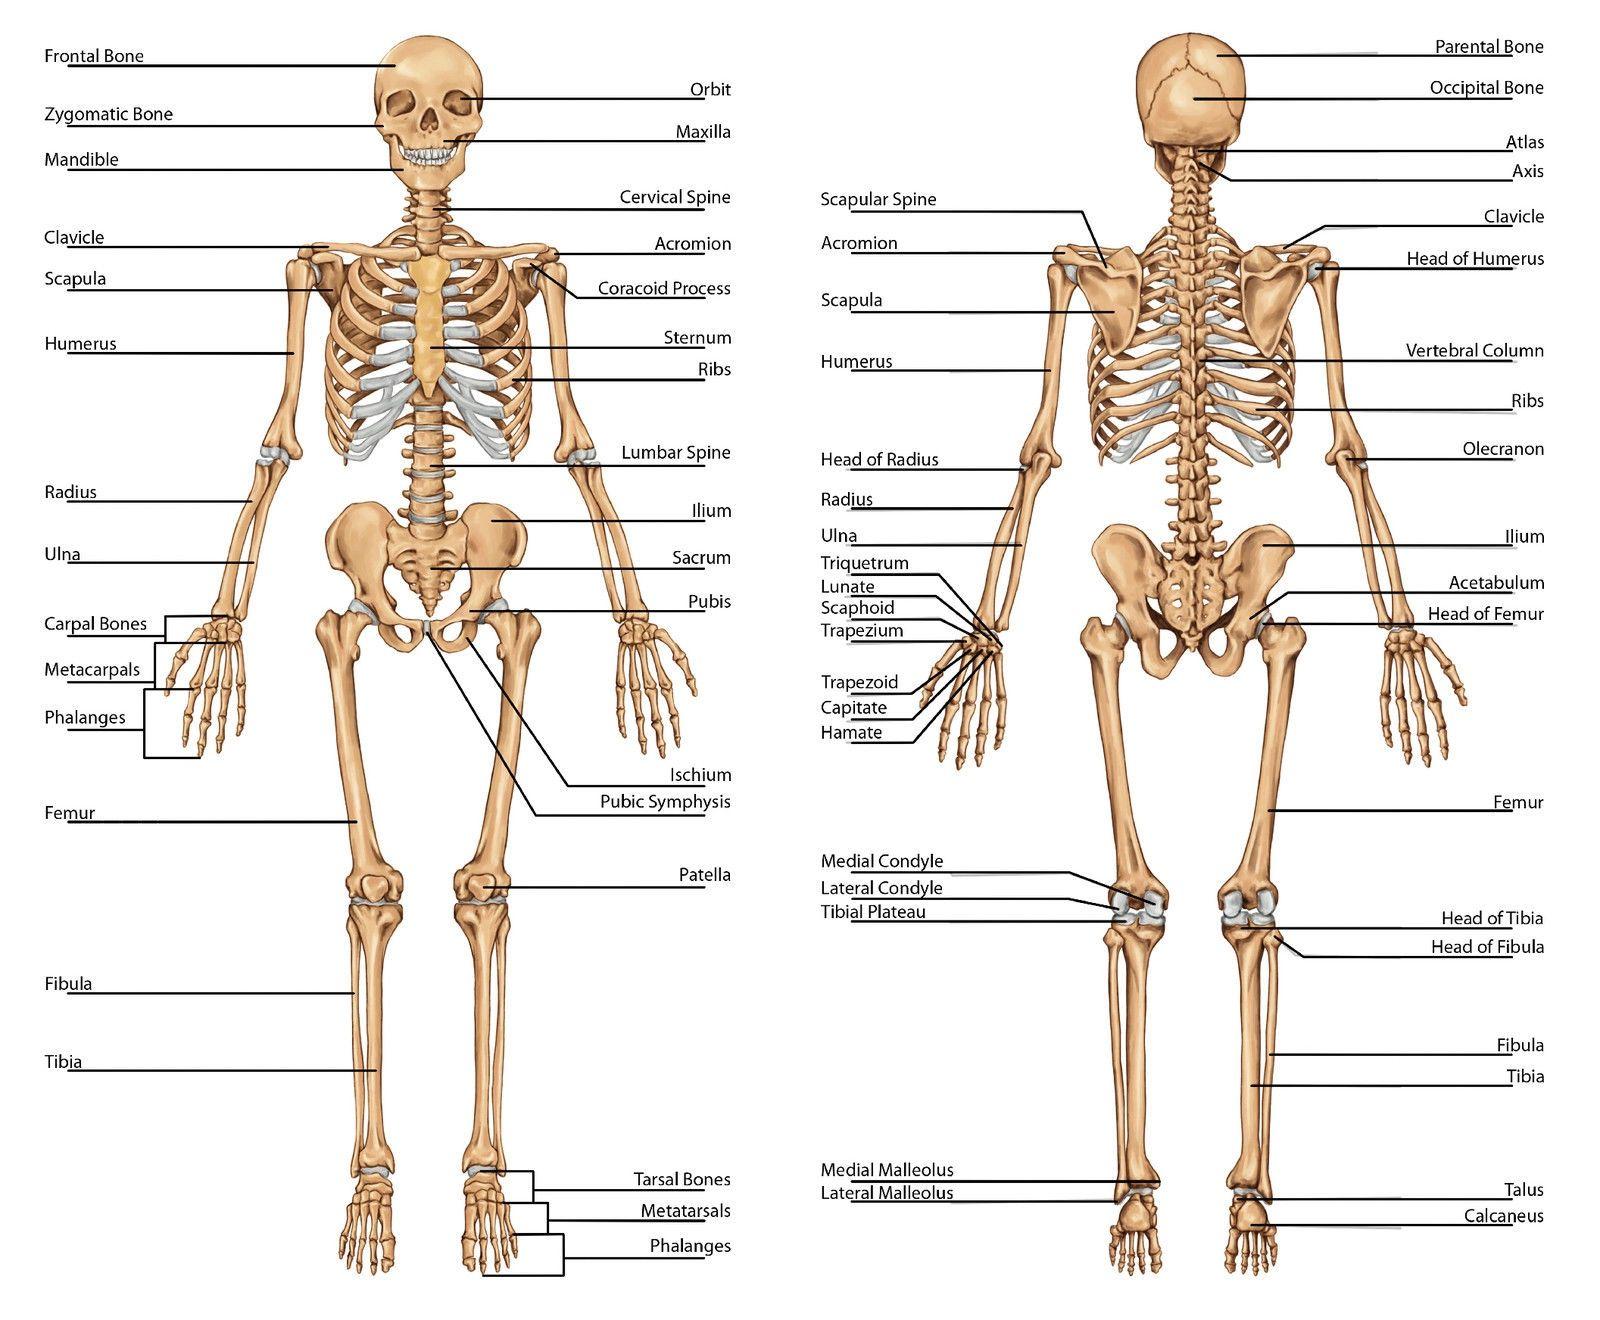 small resolution of anatomy of the bones in your body skeleton bones human skeleton anatomy bones diagram human anatomy